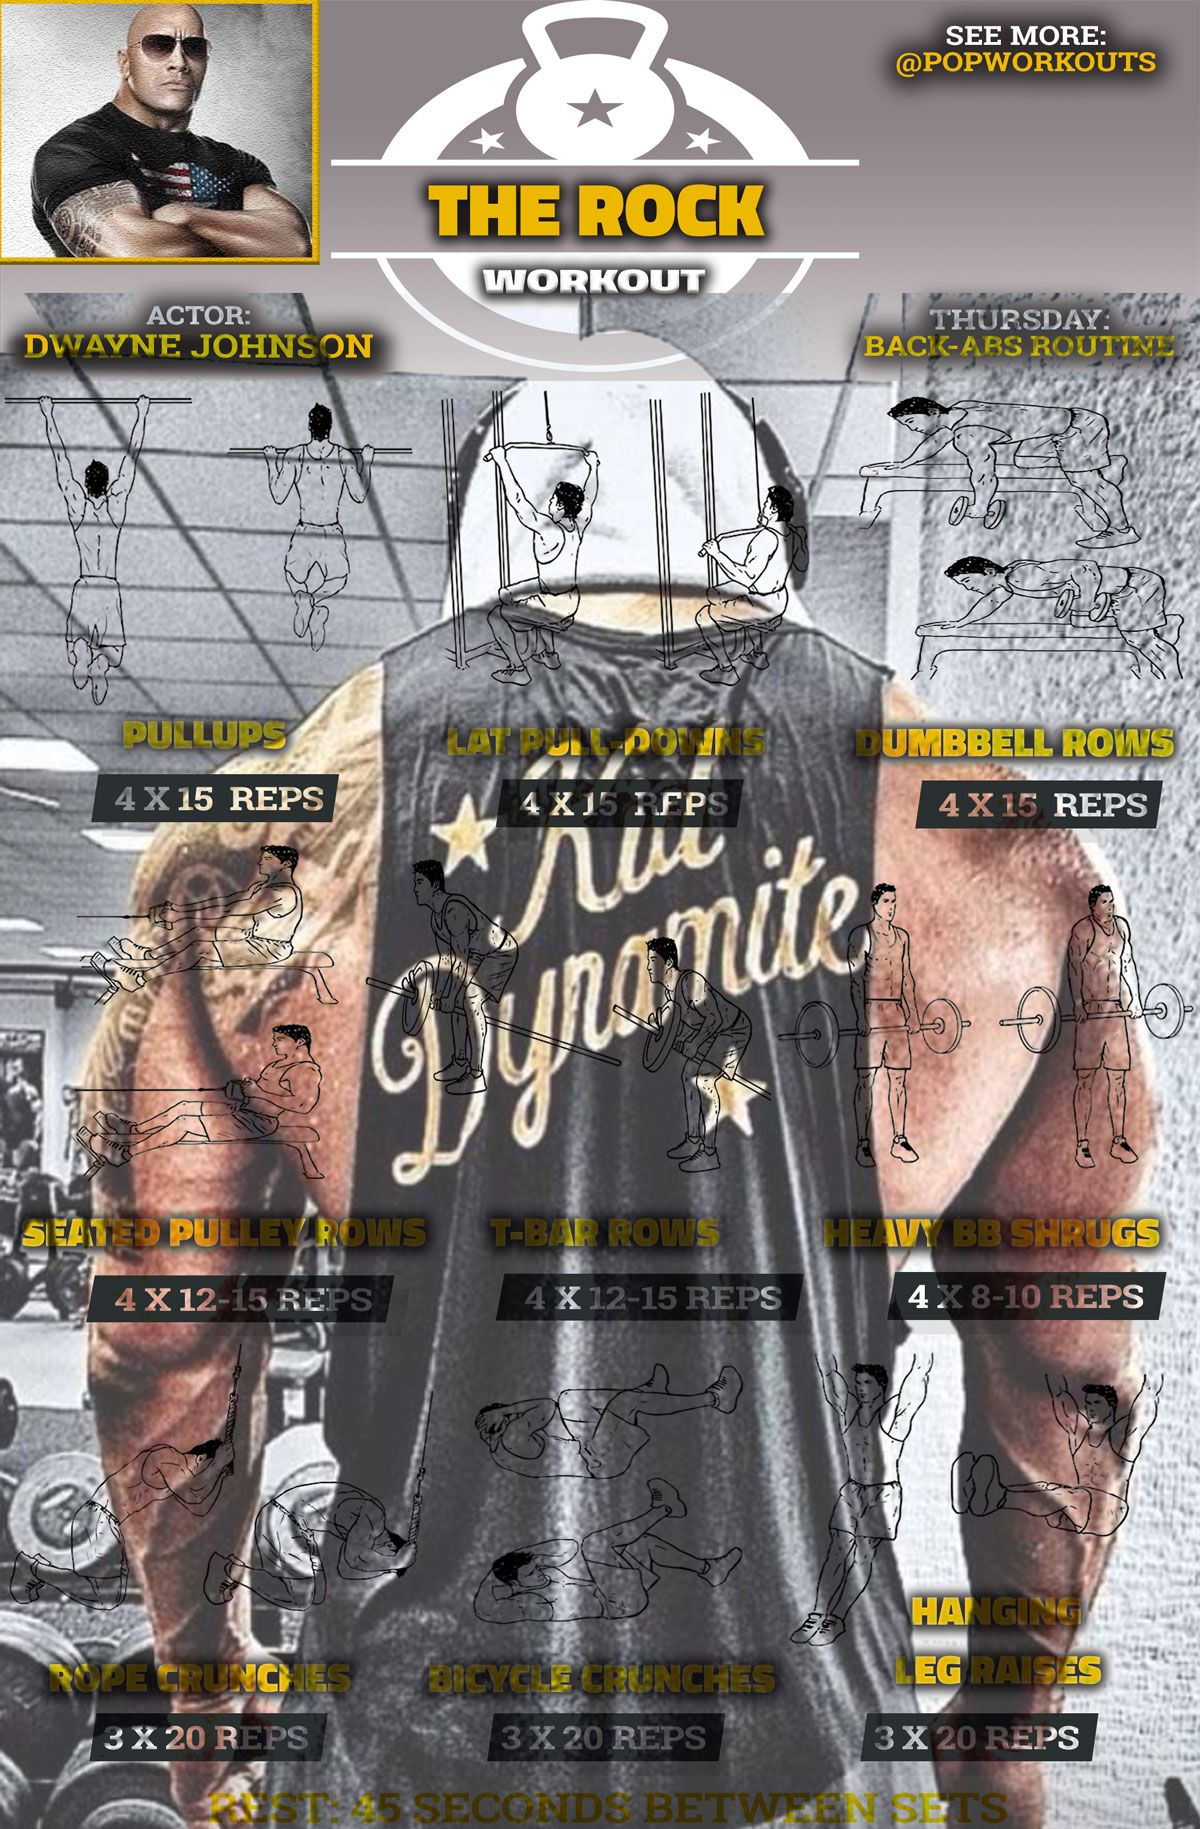 Dwayne Johnson Archives - SocialWrench